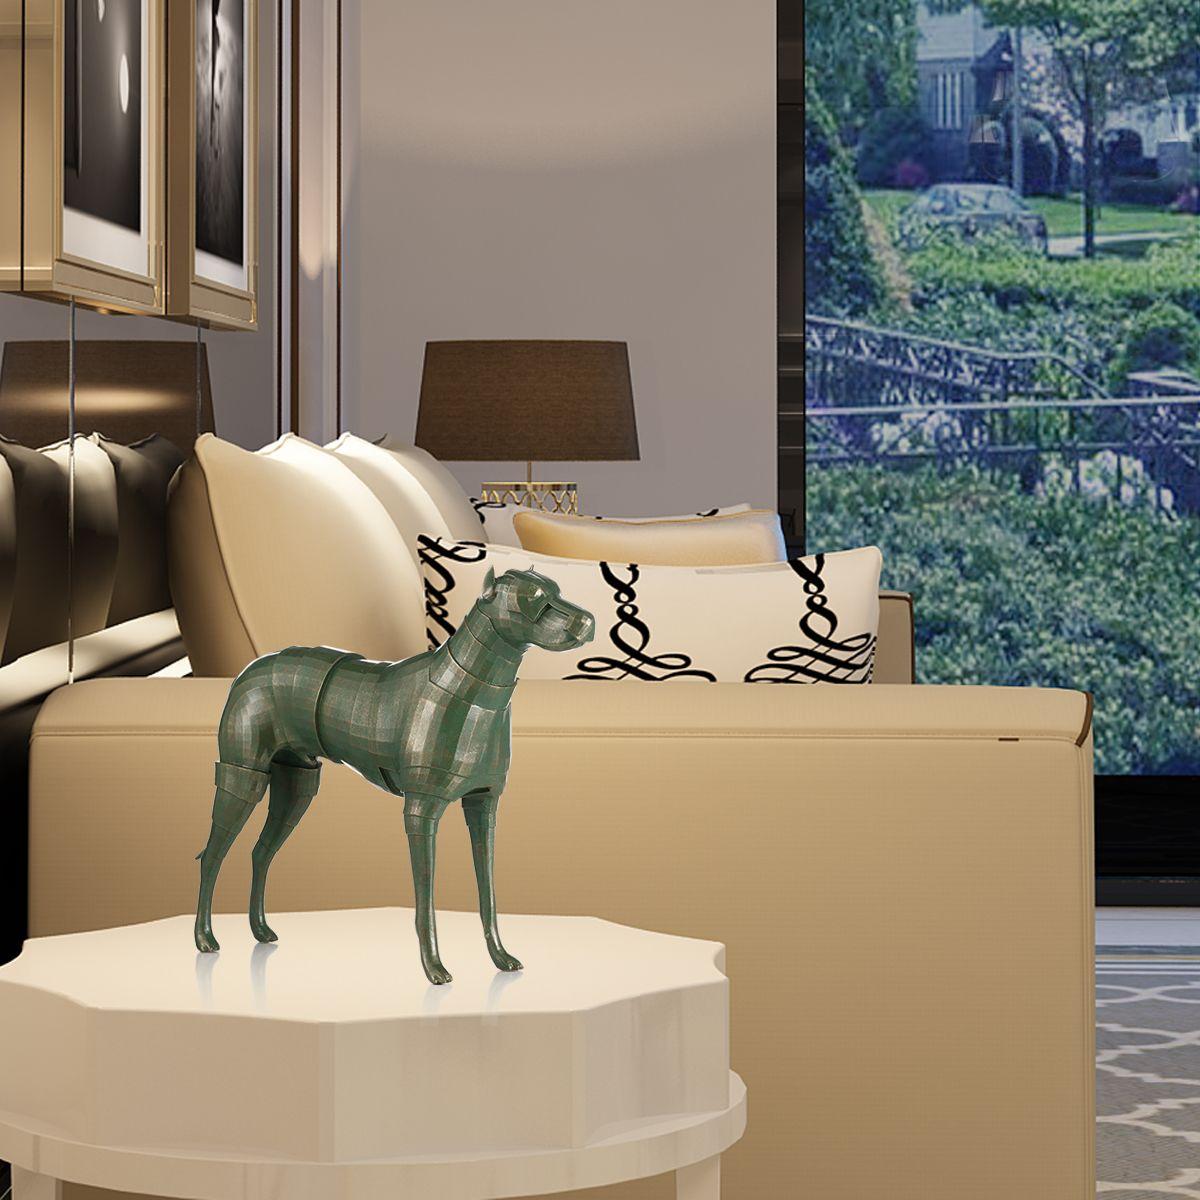 tomfeel armor dog resin escultura decoracin para el hogar original design dog